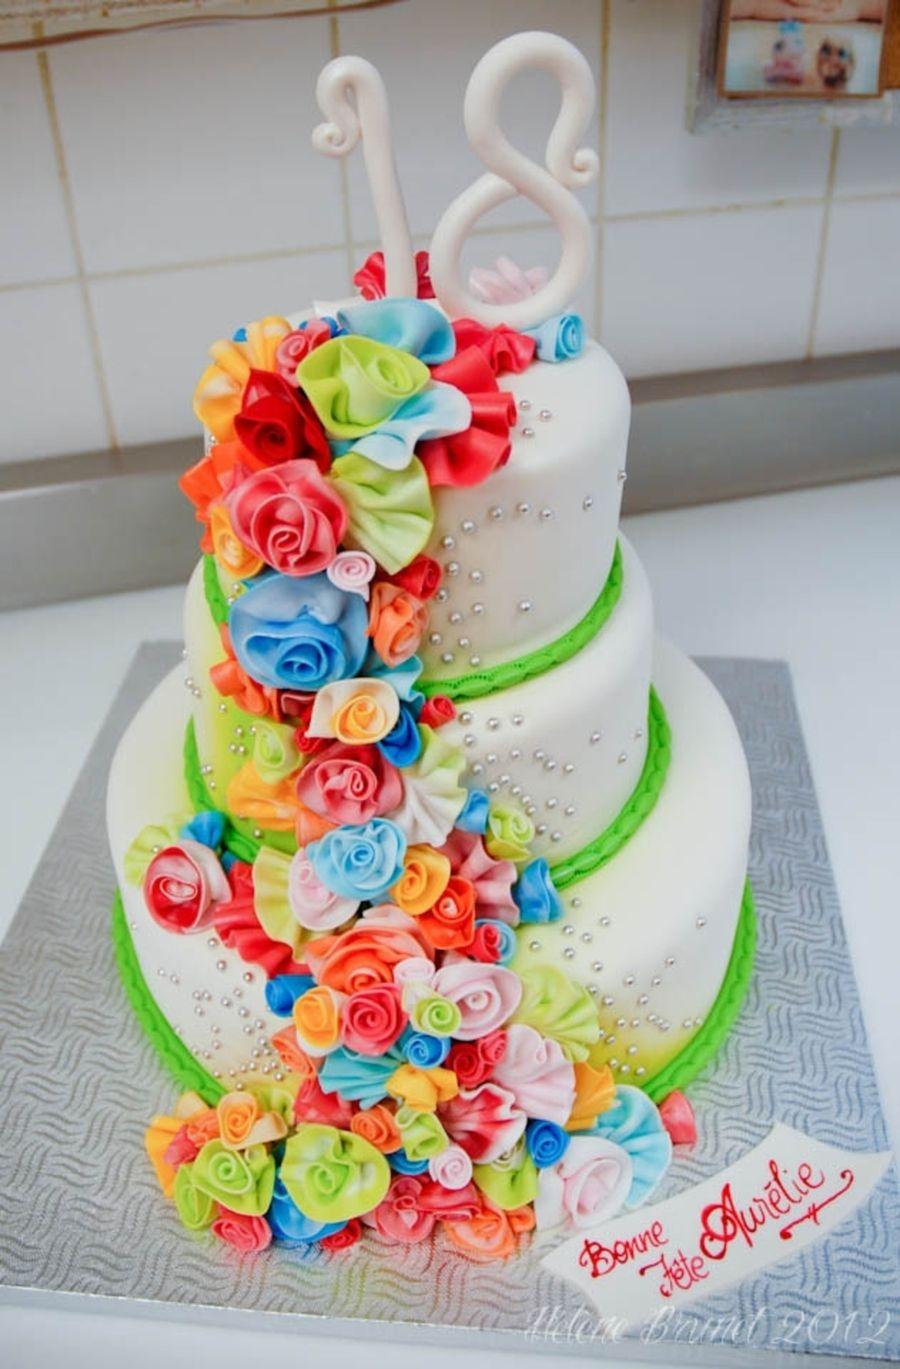 18th birthday cakes girl tumblr